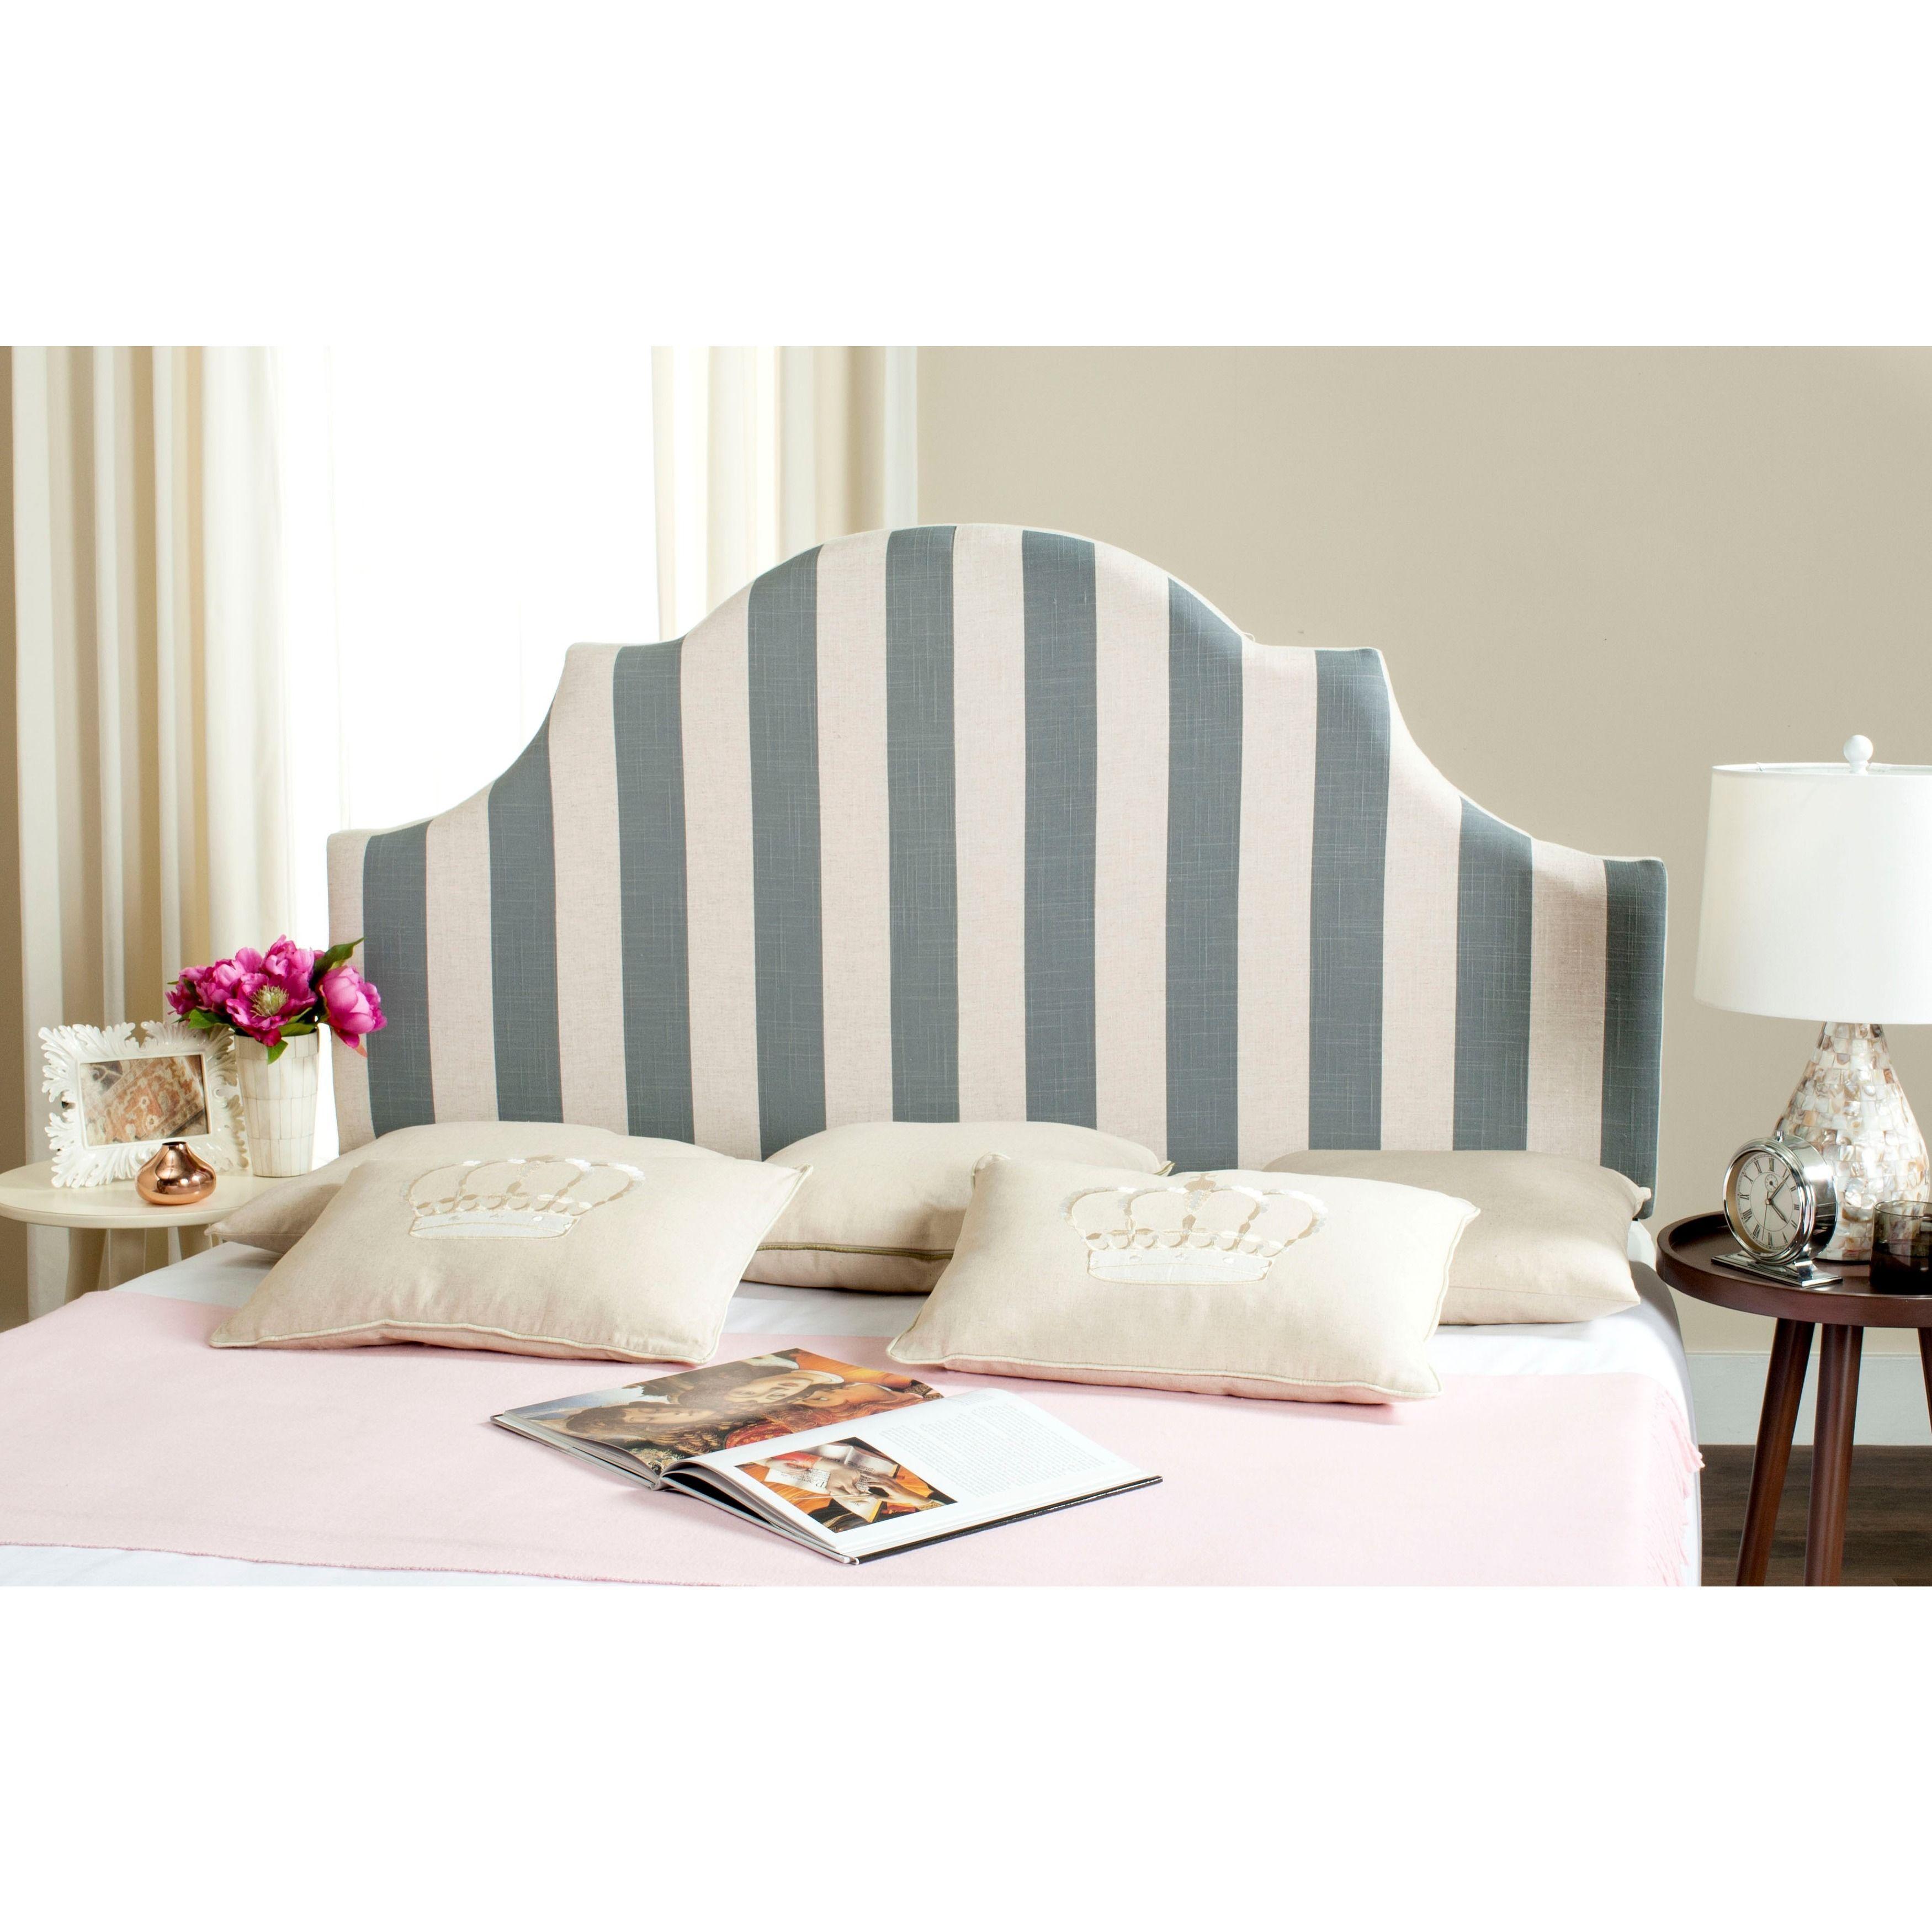 3111d5026a7ffe Safavieh Hallmar Grey/ White Stripe Upholstered Arched Headboard (Queen)  (MCR4680M)